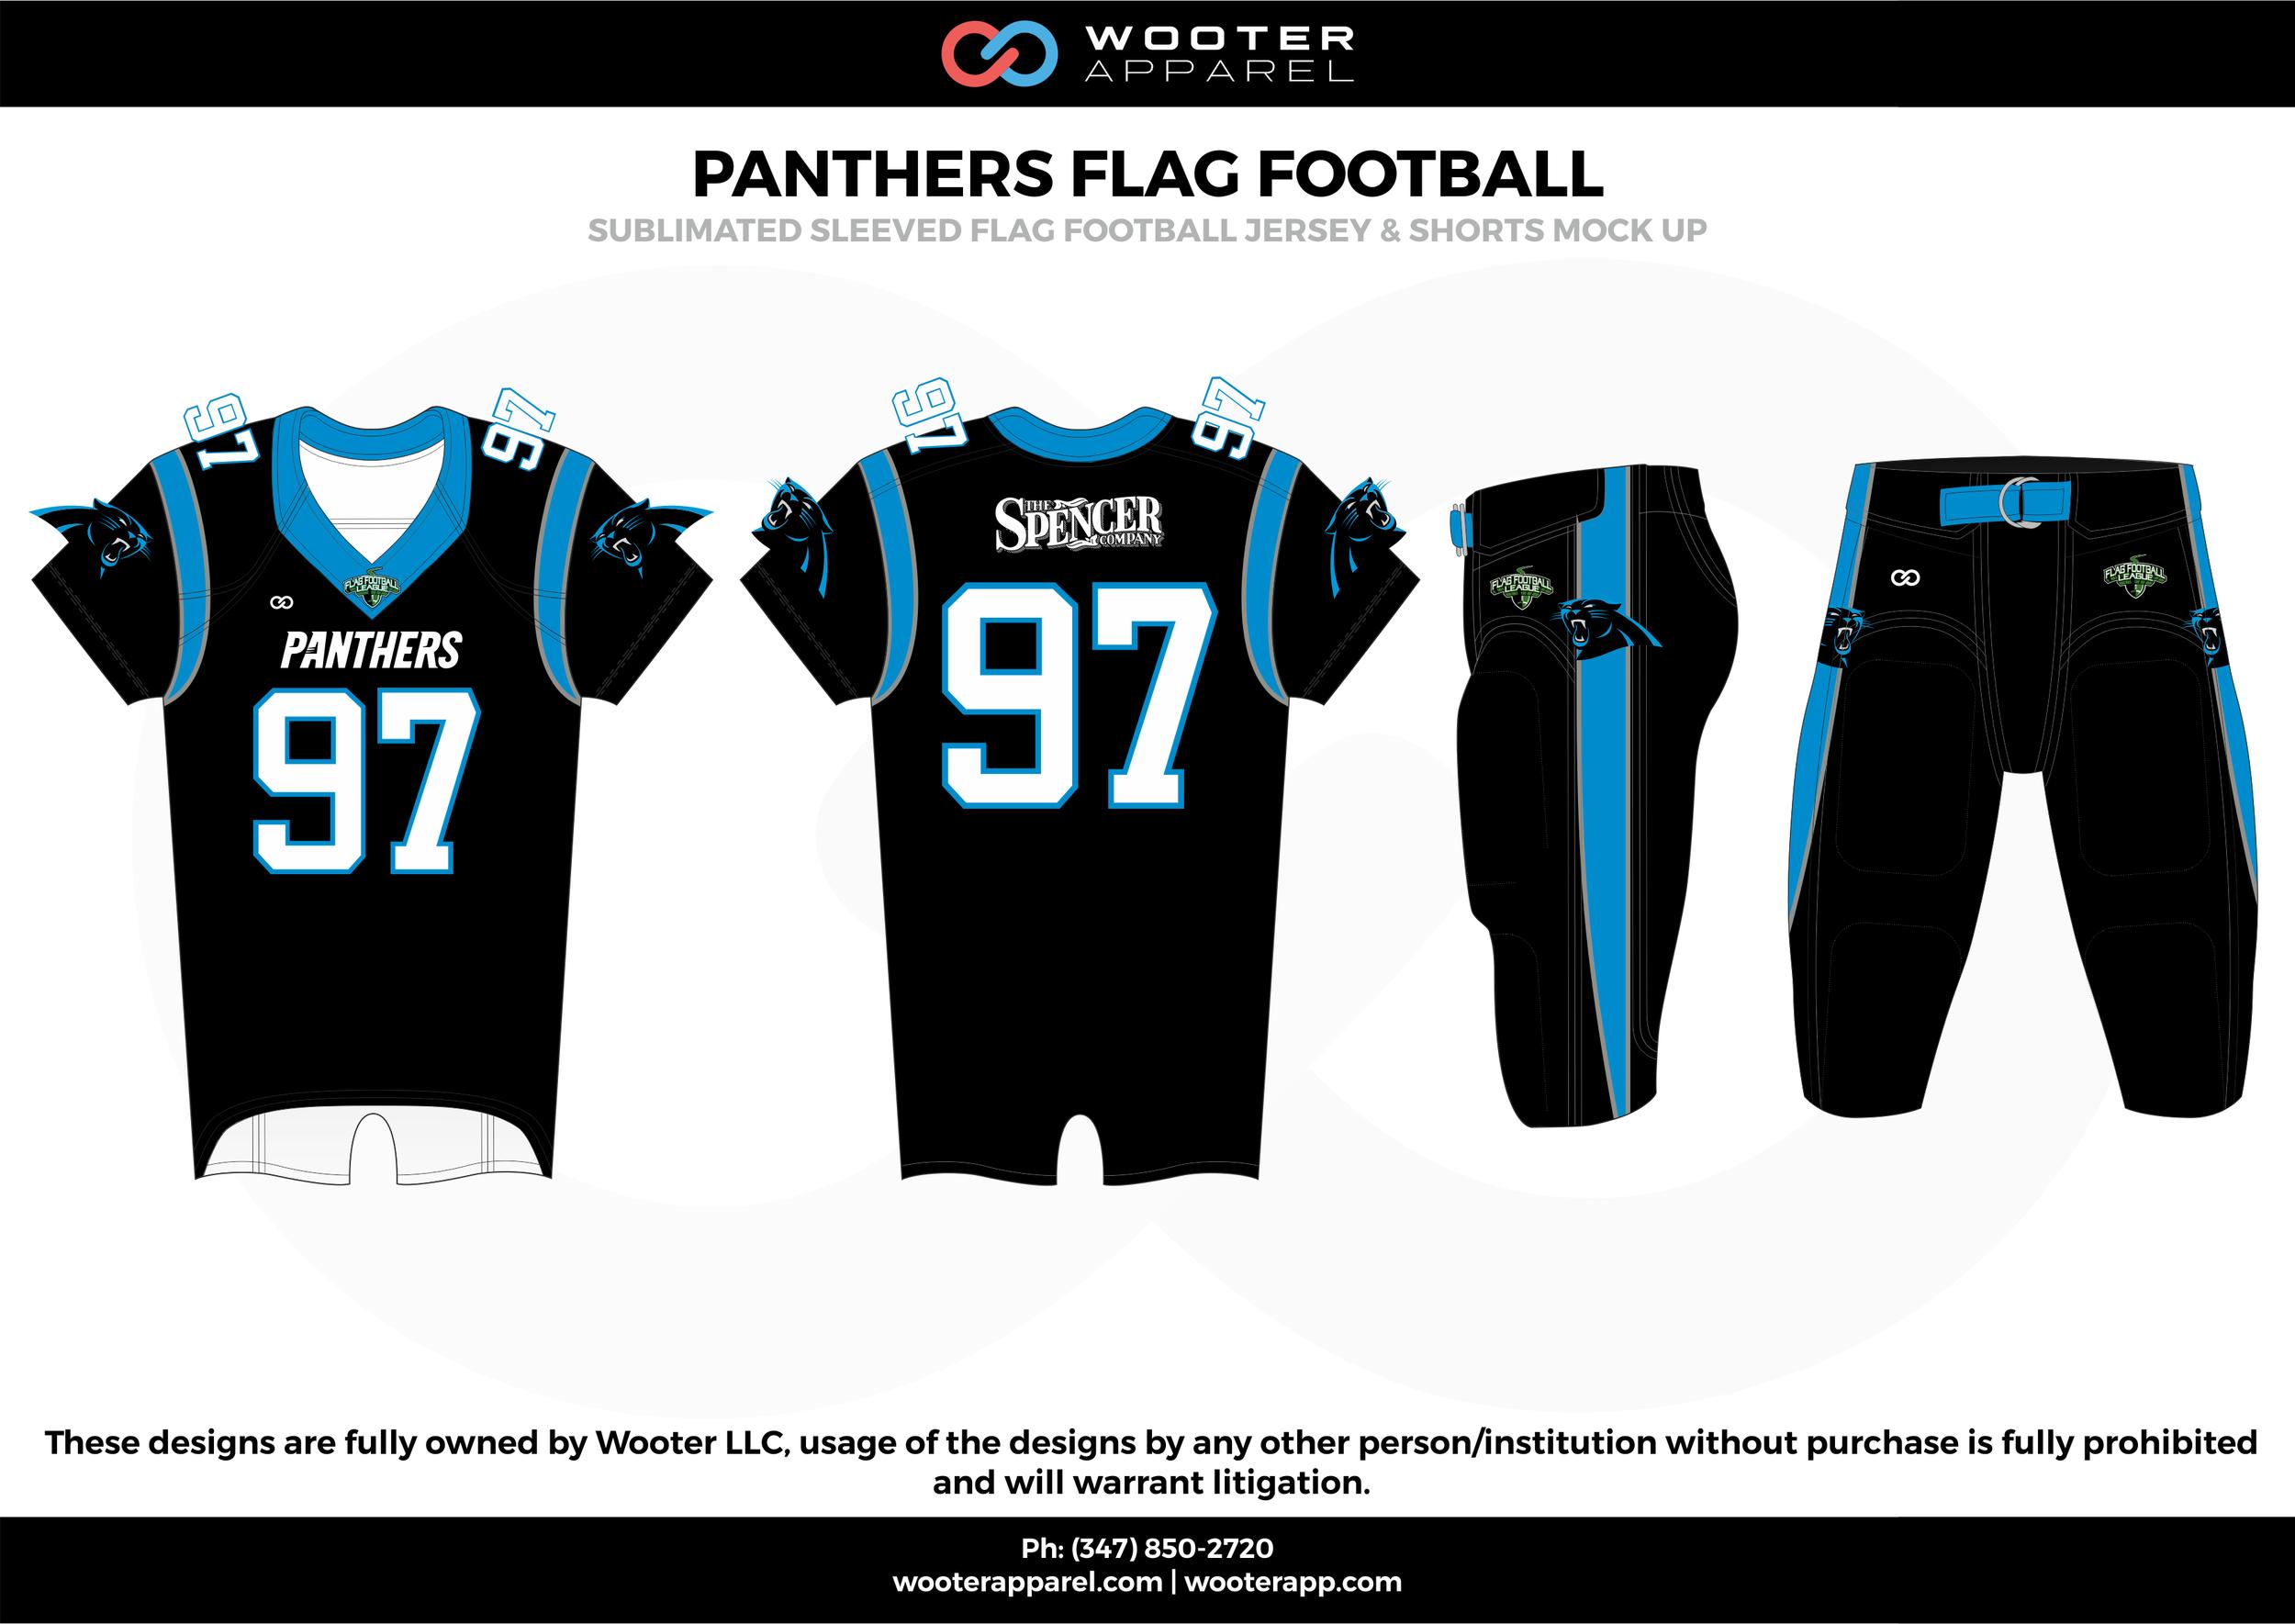 PANTHERS FLAG FOOTBALL black blue white flag football uniforms jerseys pants